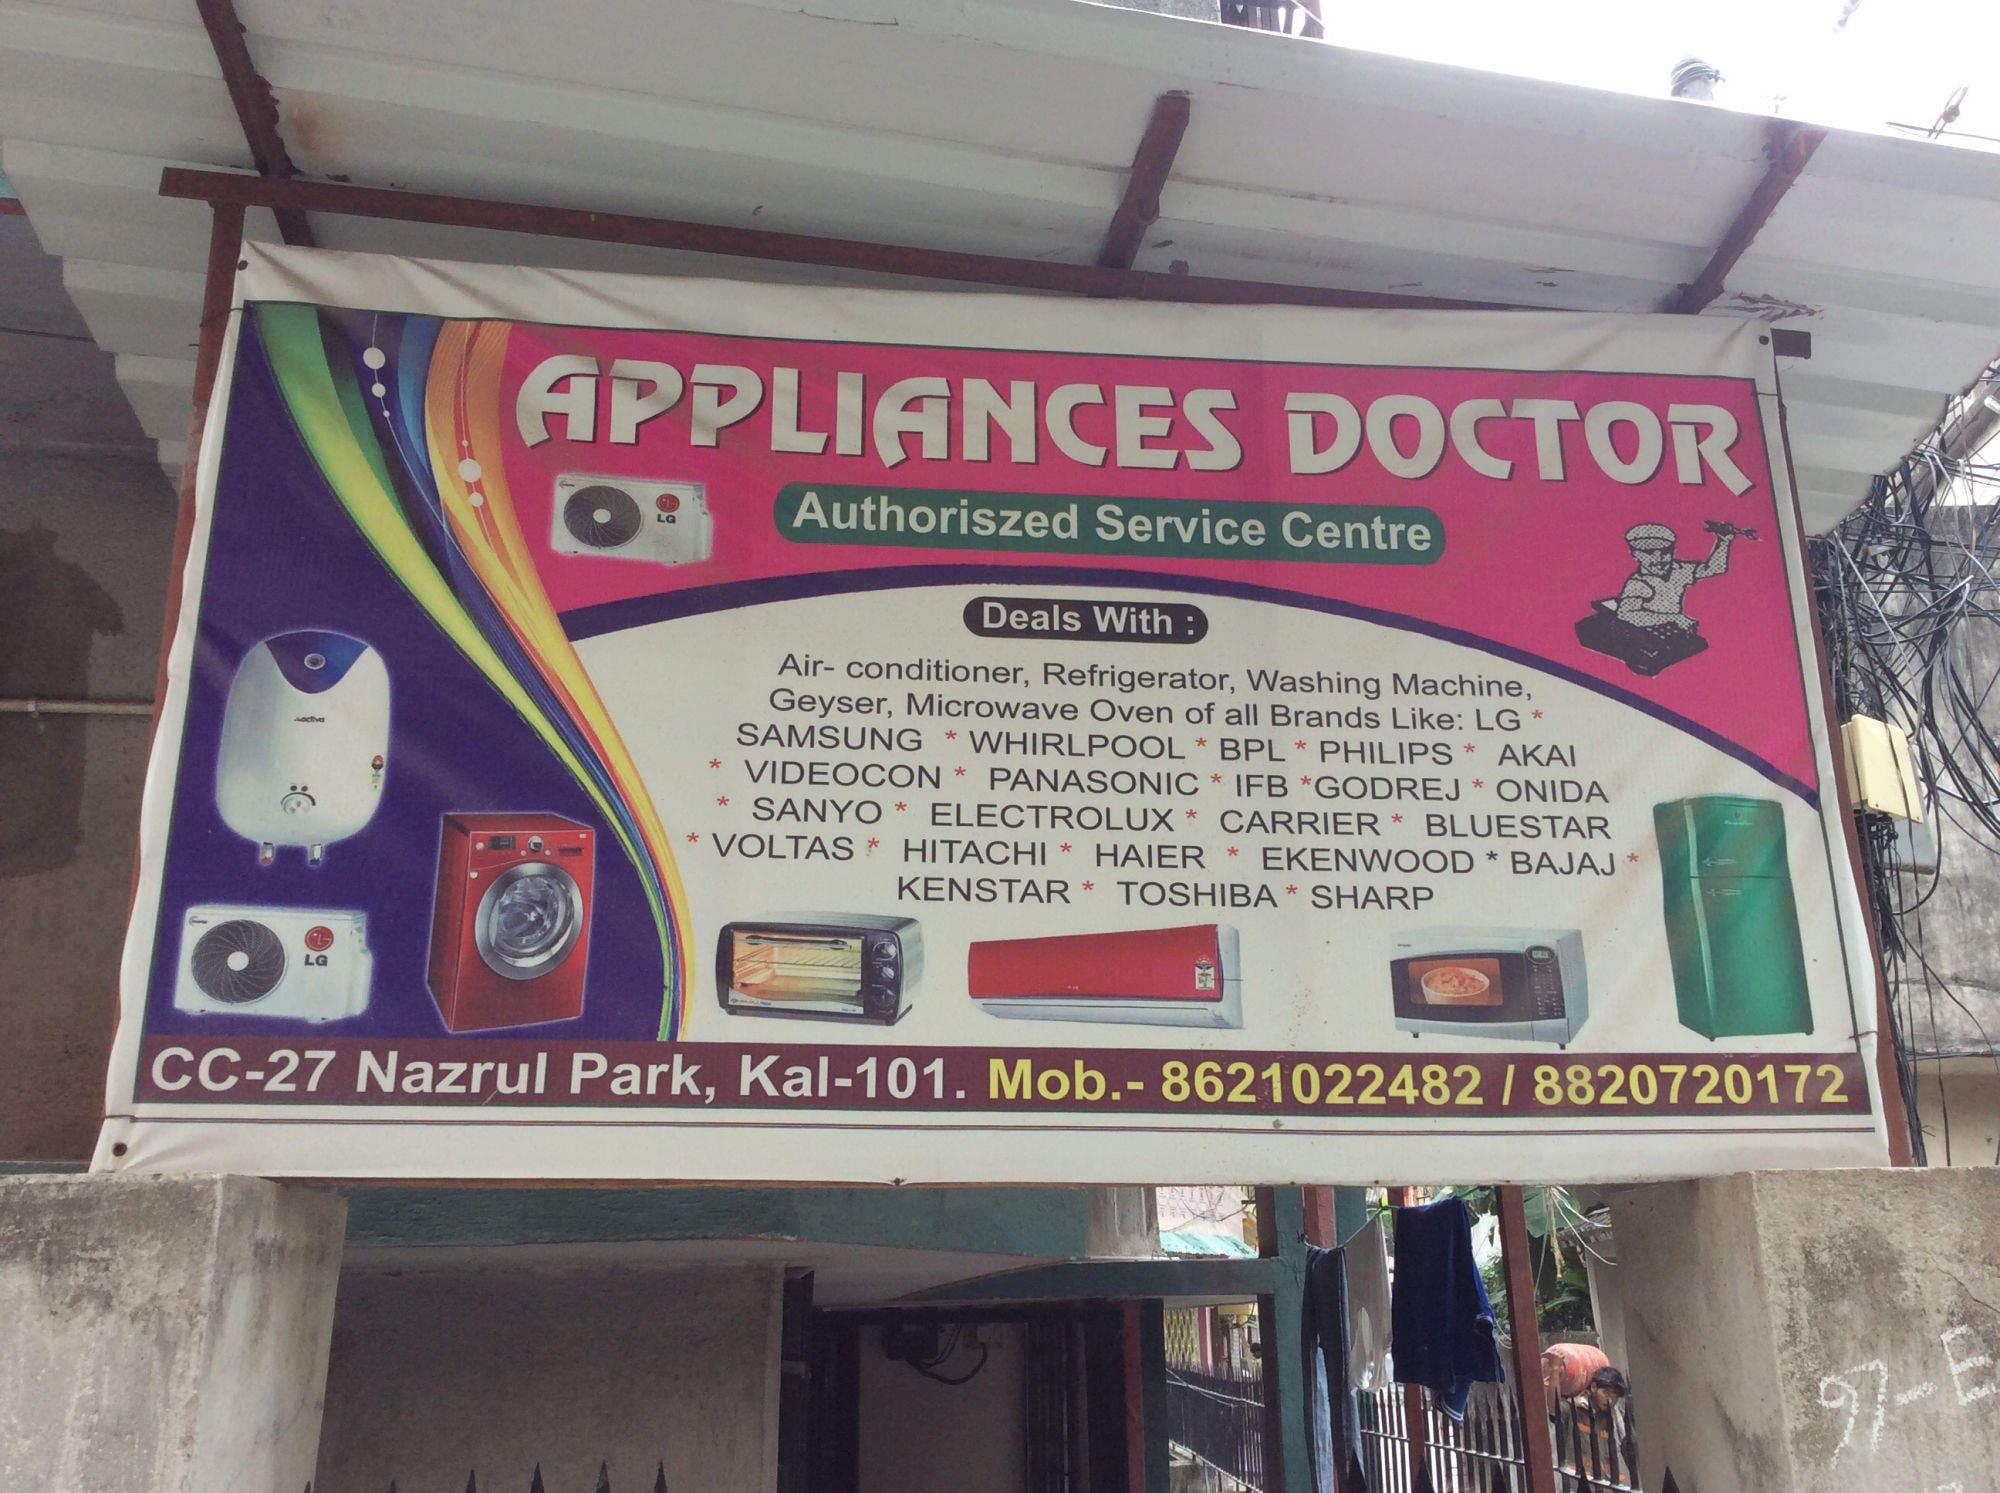 Sansui Microwave Oven Repair Services Kankurgachi Kolkata